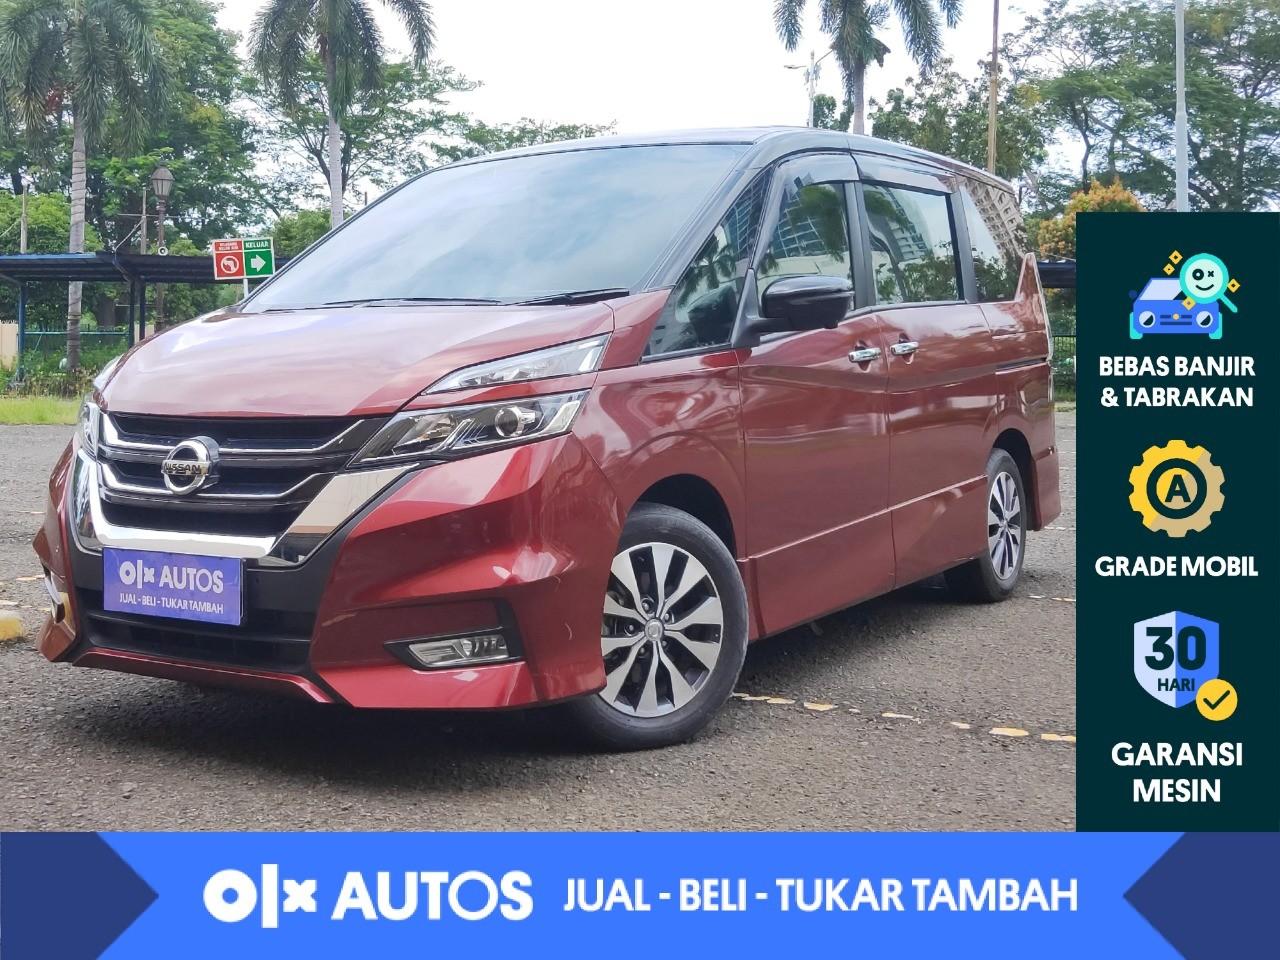 [OLXAutos] Nissan Serena 2.0 Highway Star bensin A/T 2019 Merah